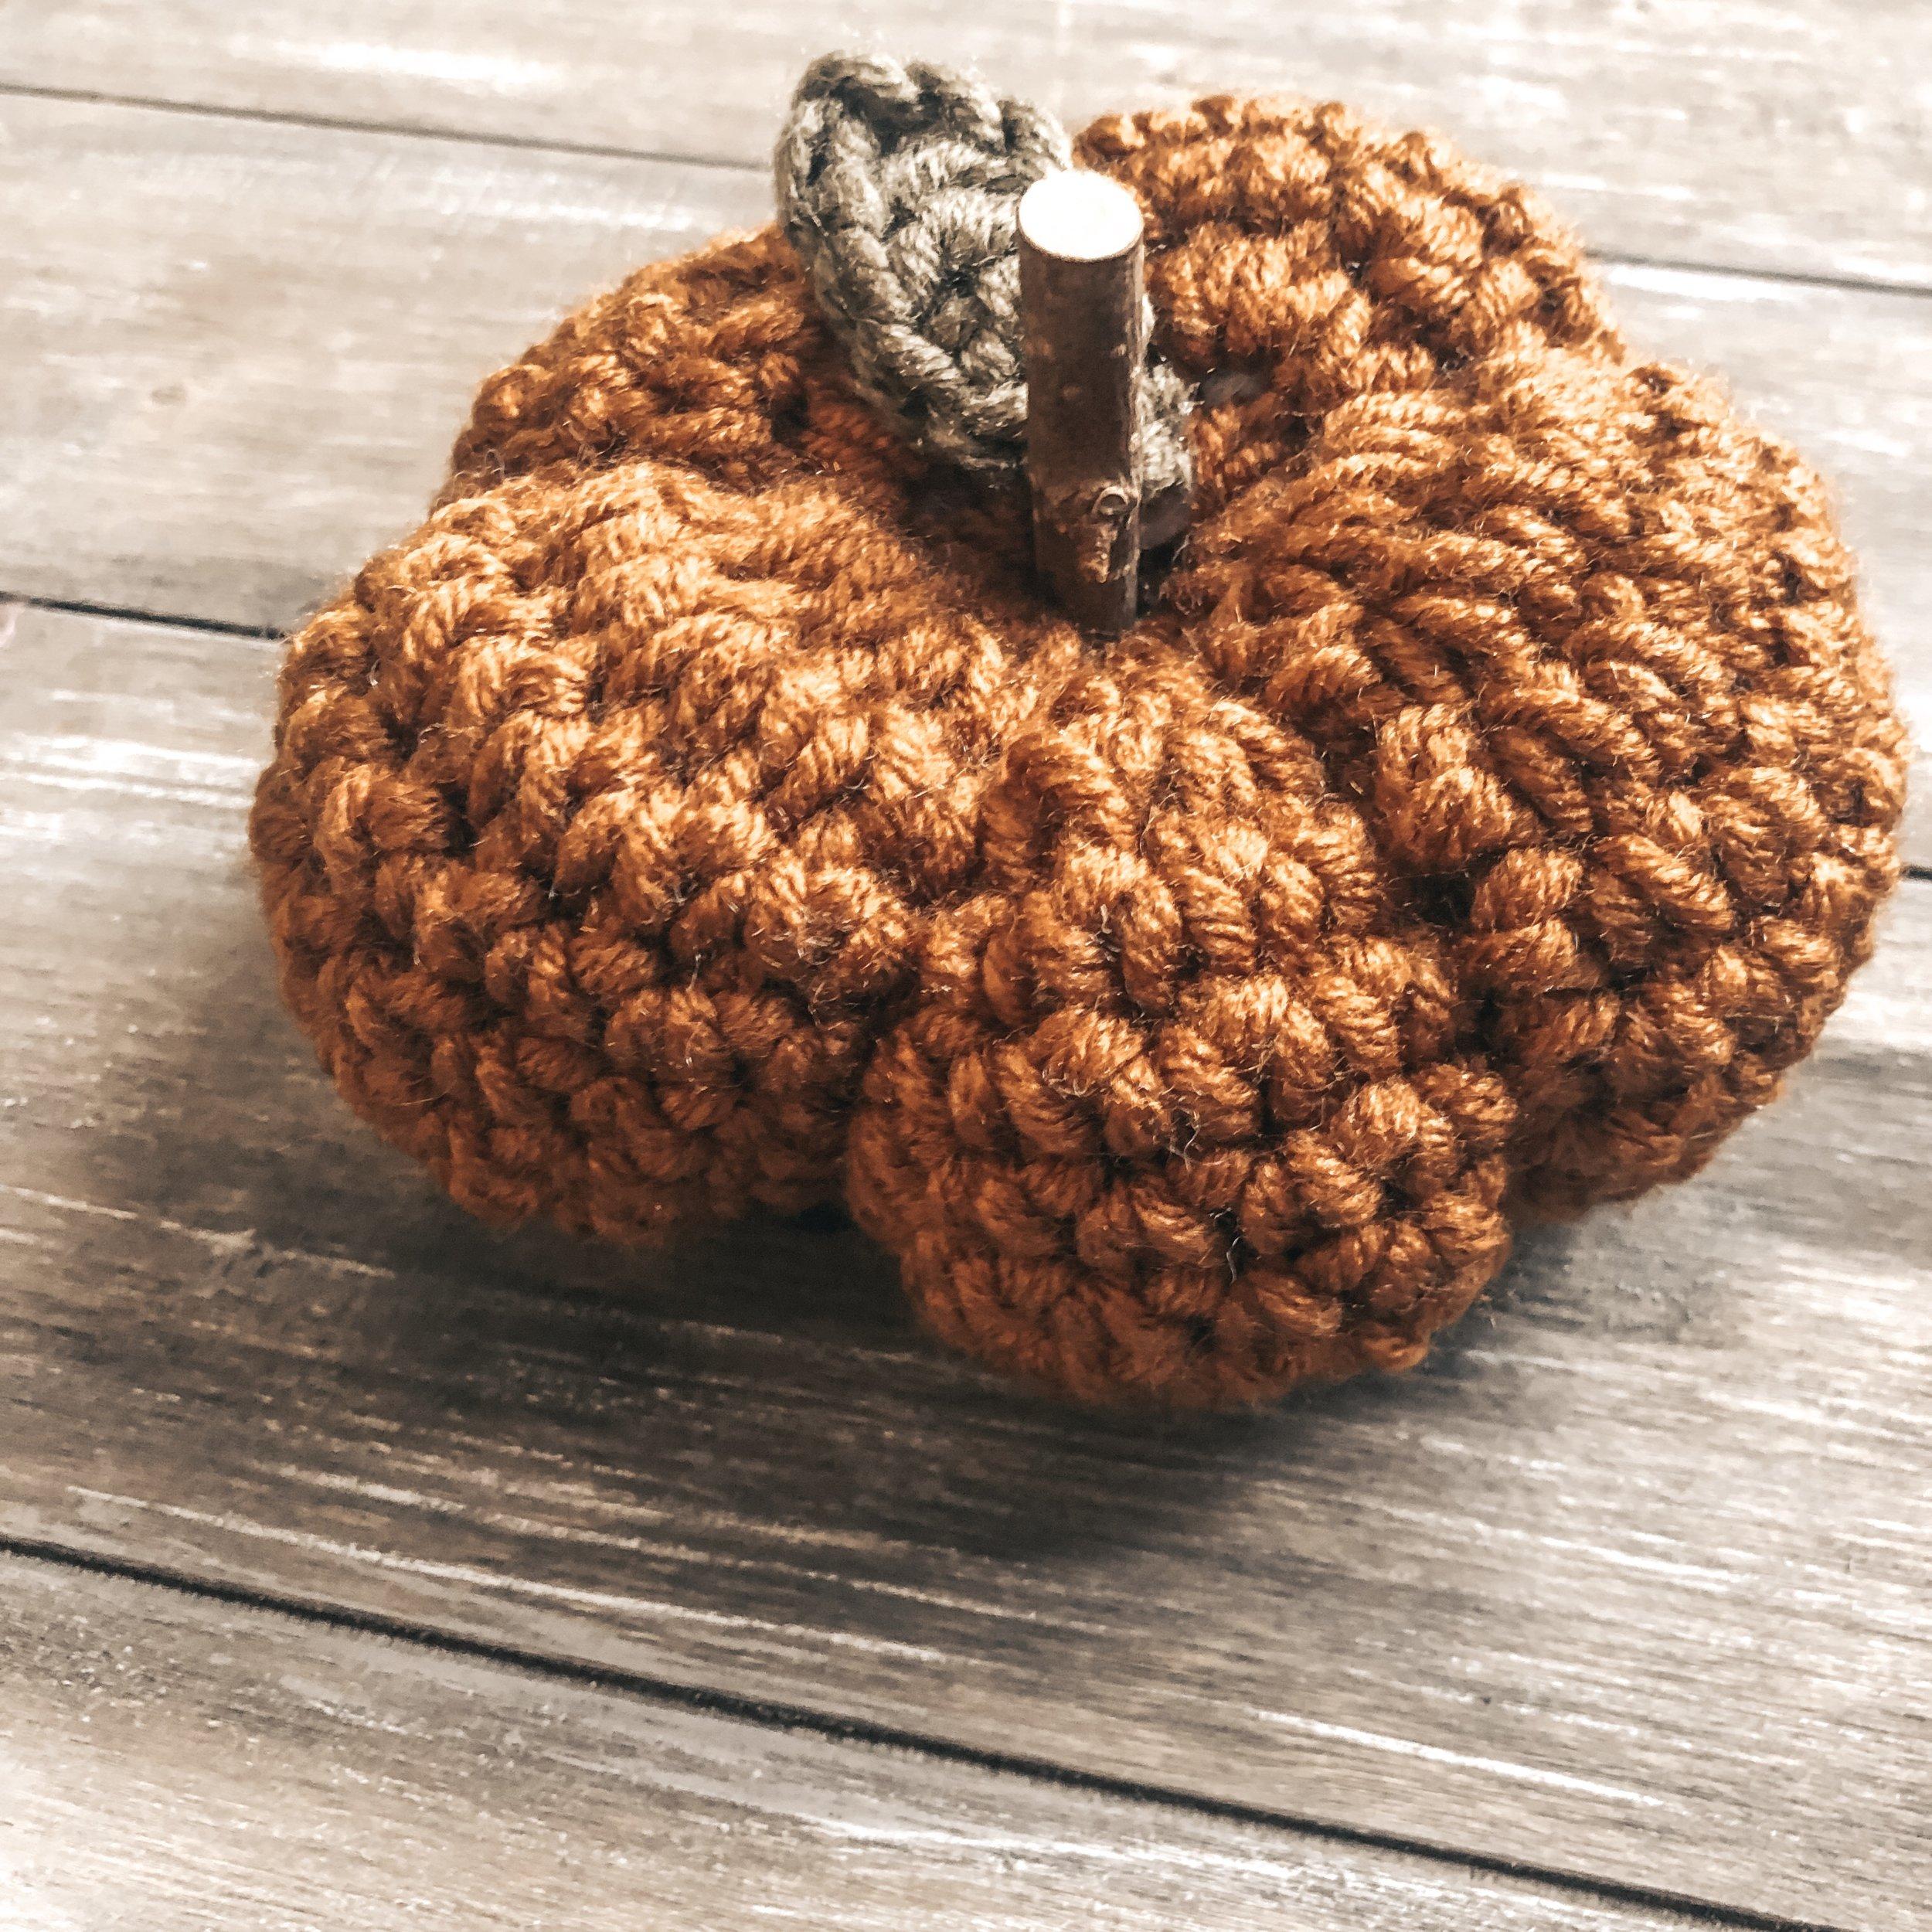 Kombucha pumpkin with Avocado leaf and a wooden stem